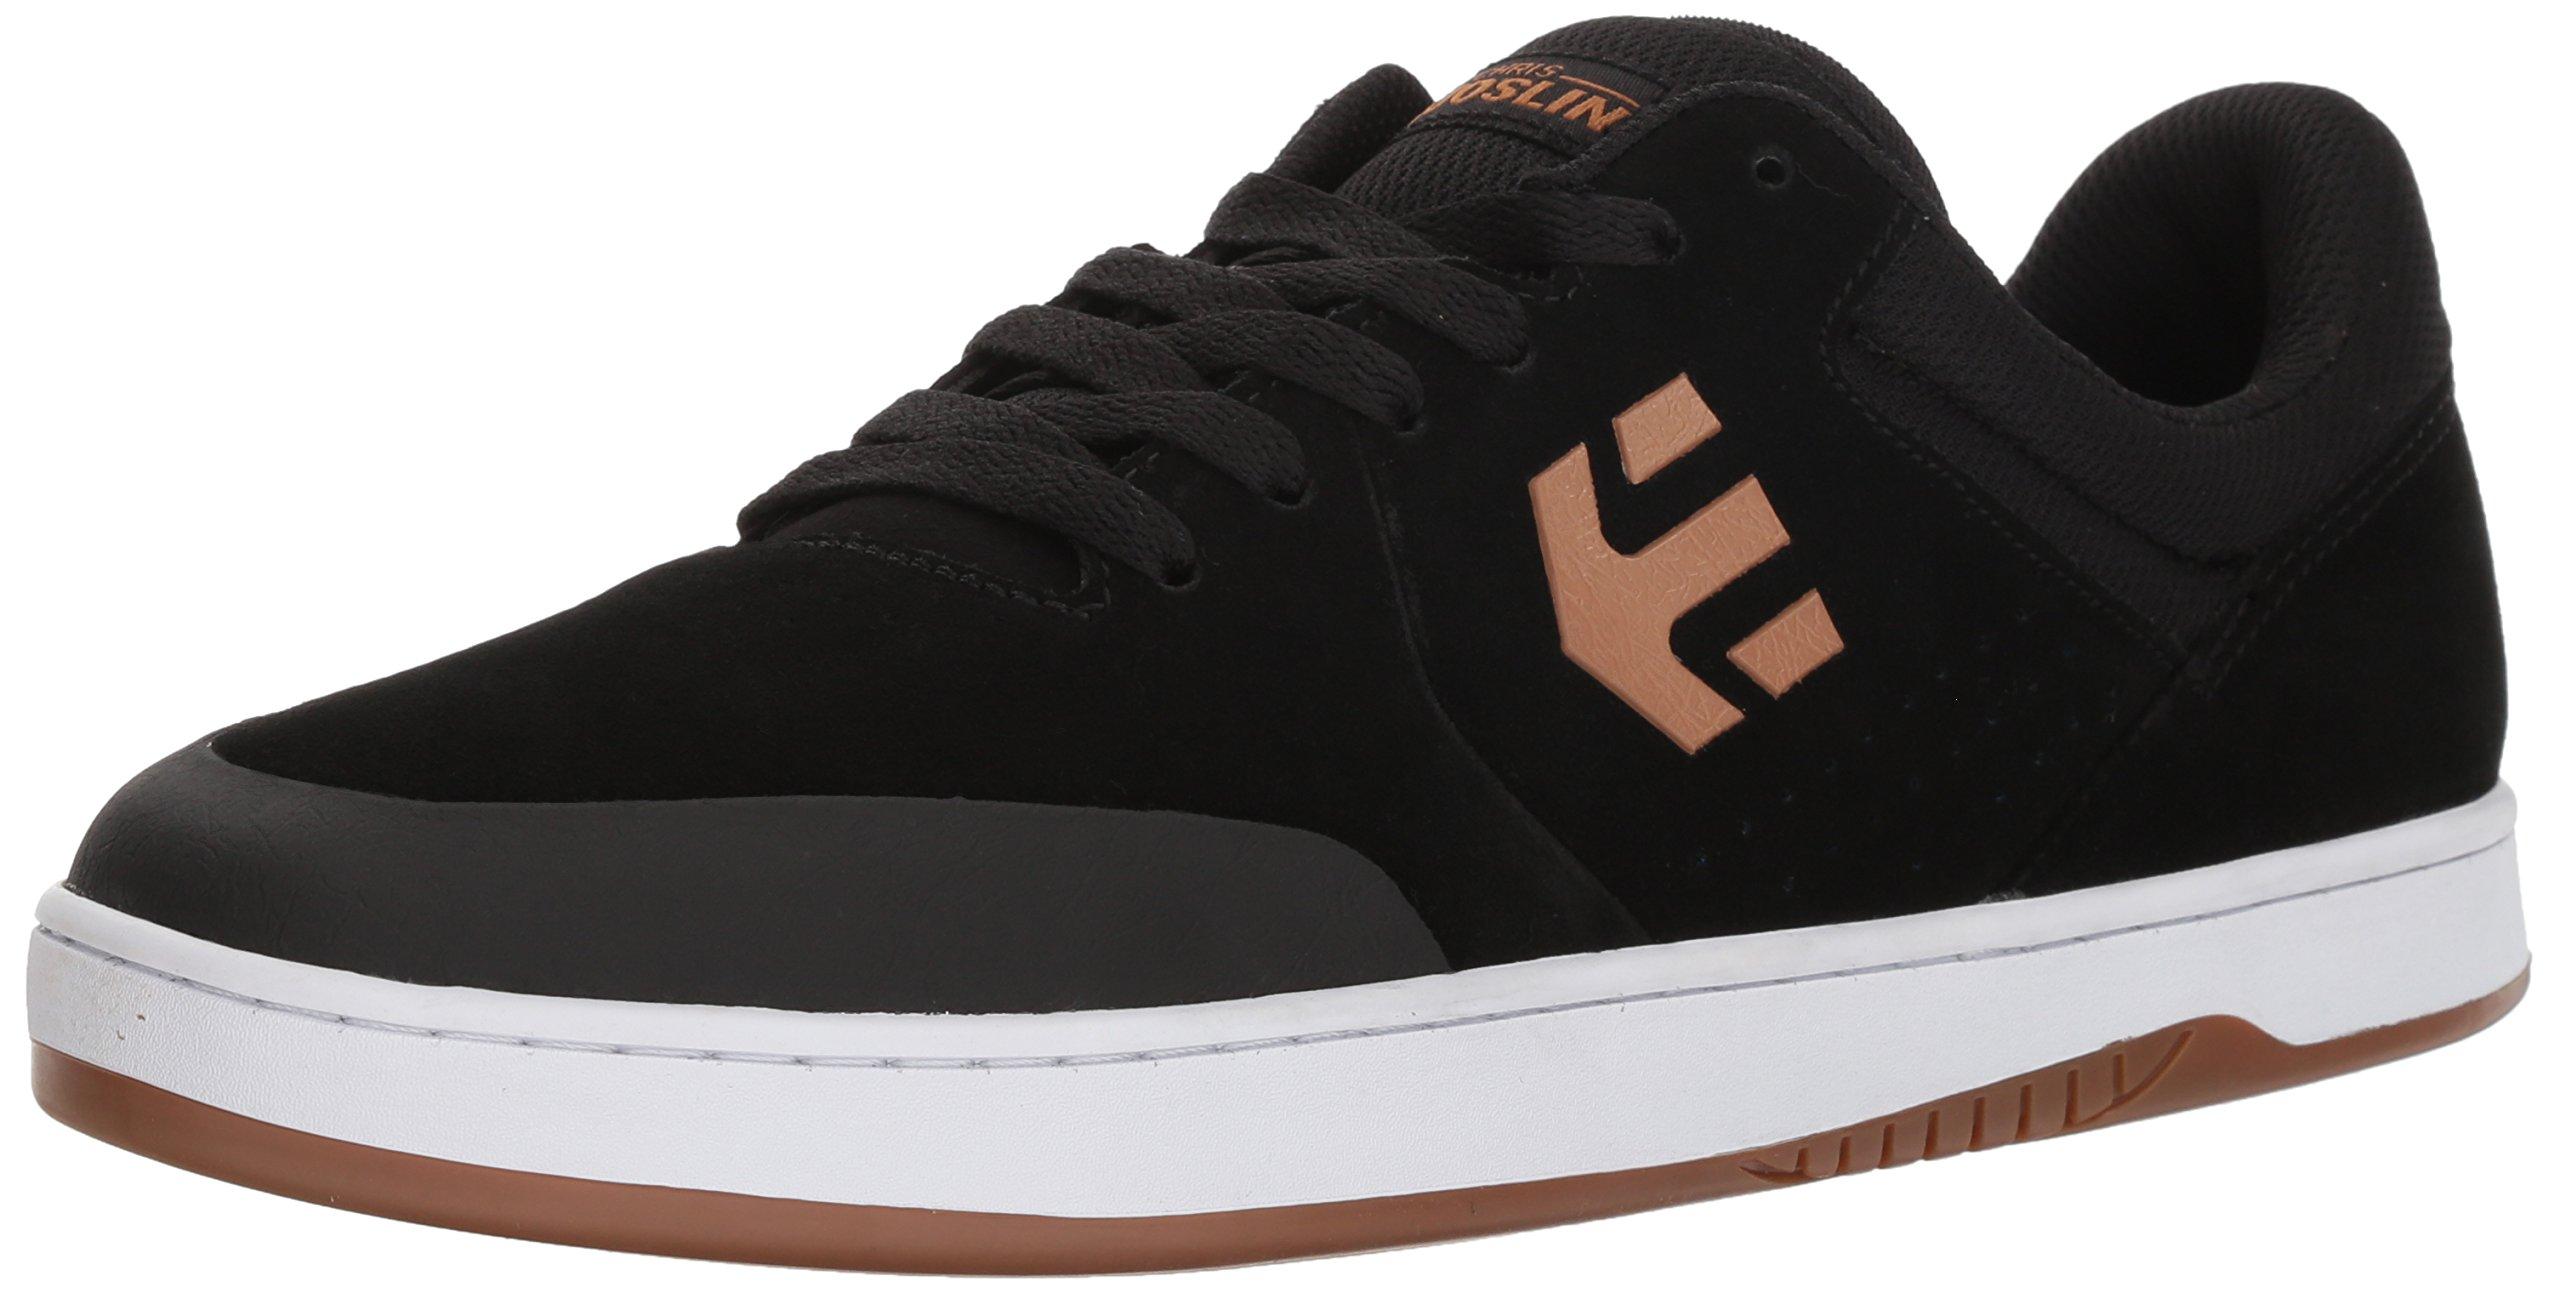 Etnies Men's Marana Skate Shoe, Black/tan, 13